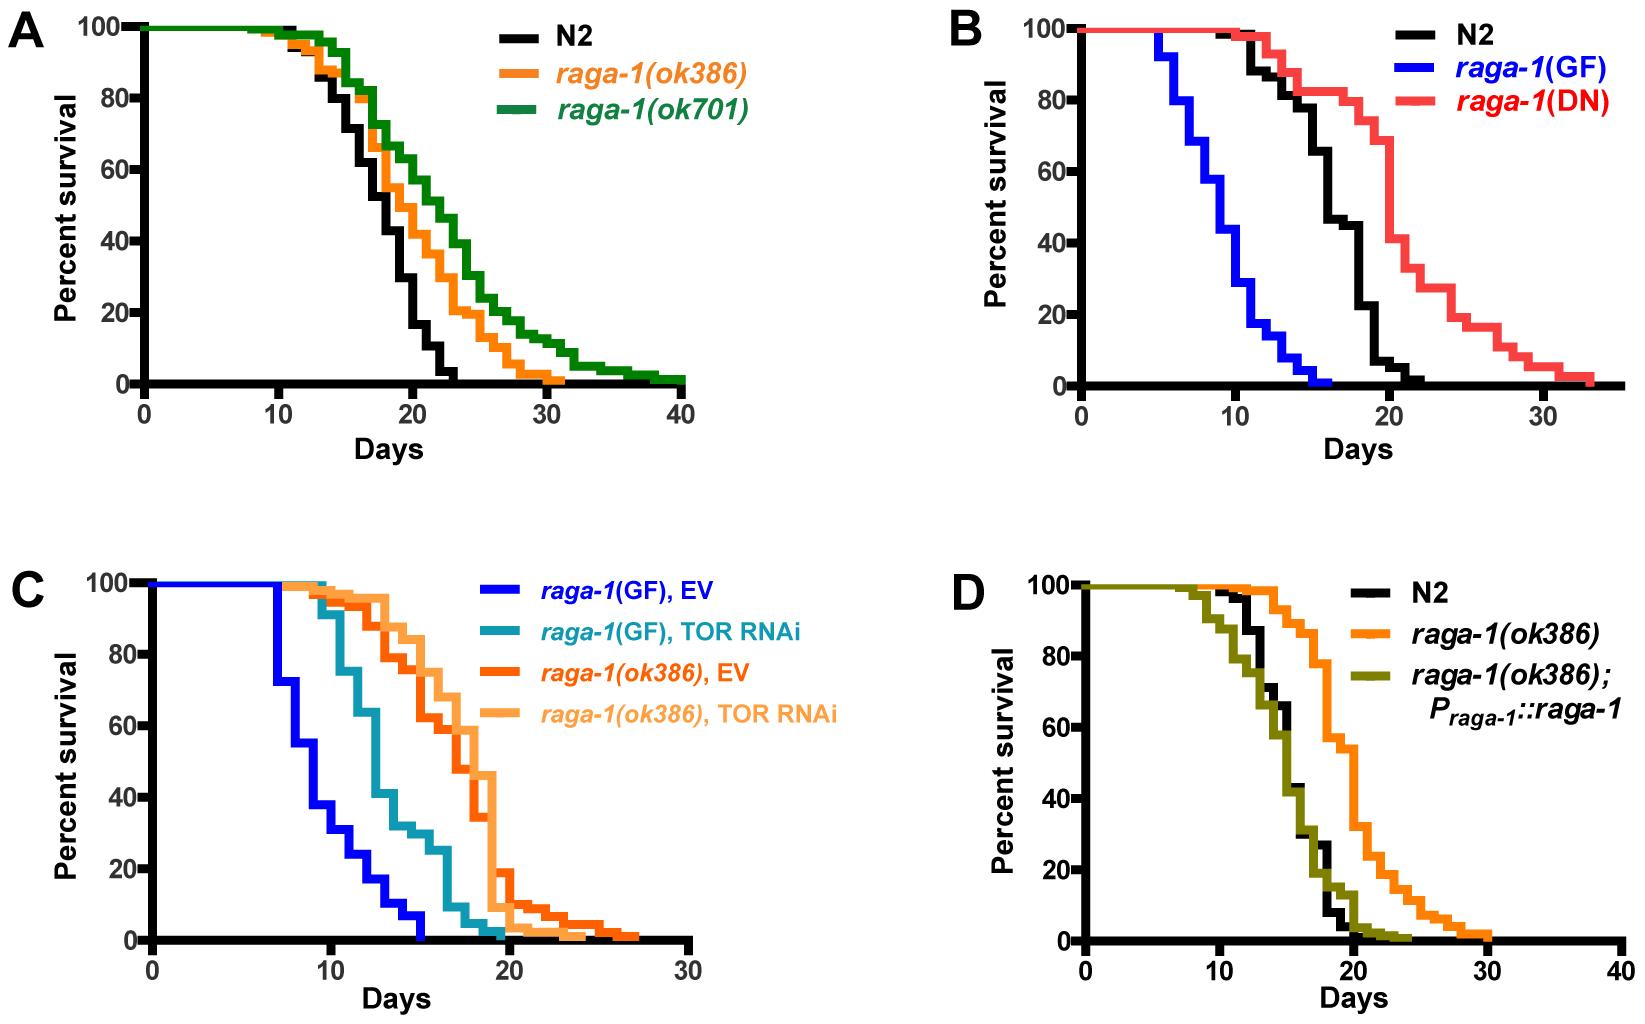 Genetic alteration of <i>raga-1</i> affects lifespan.